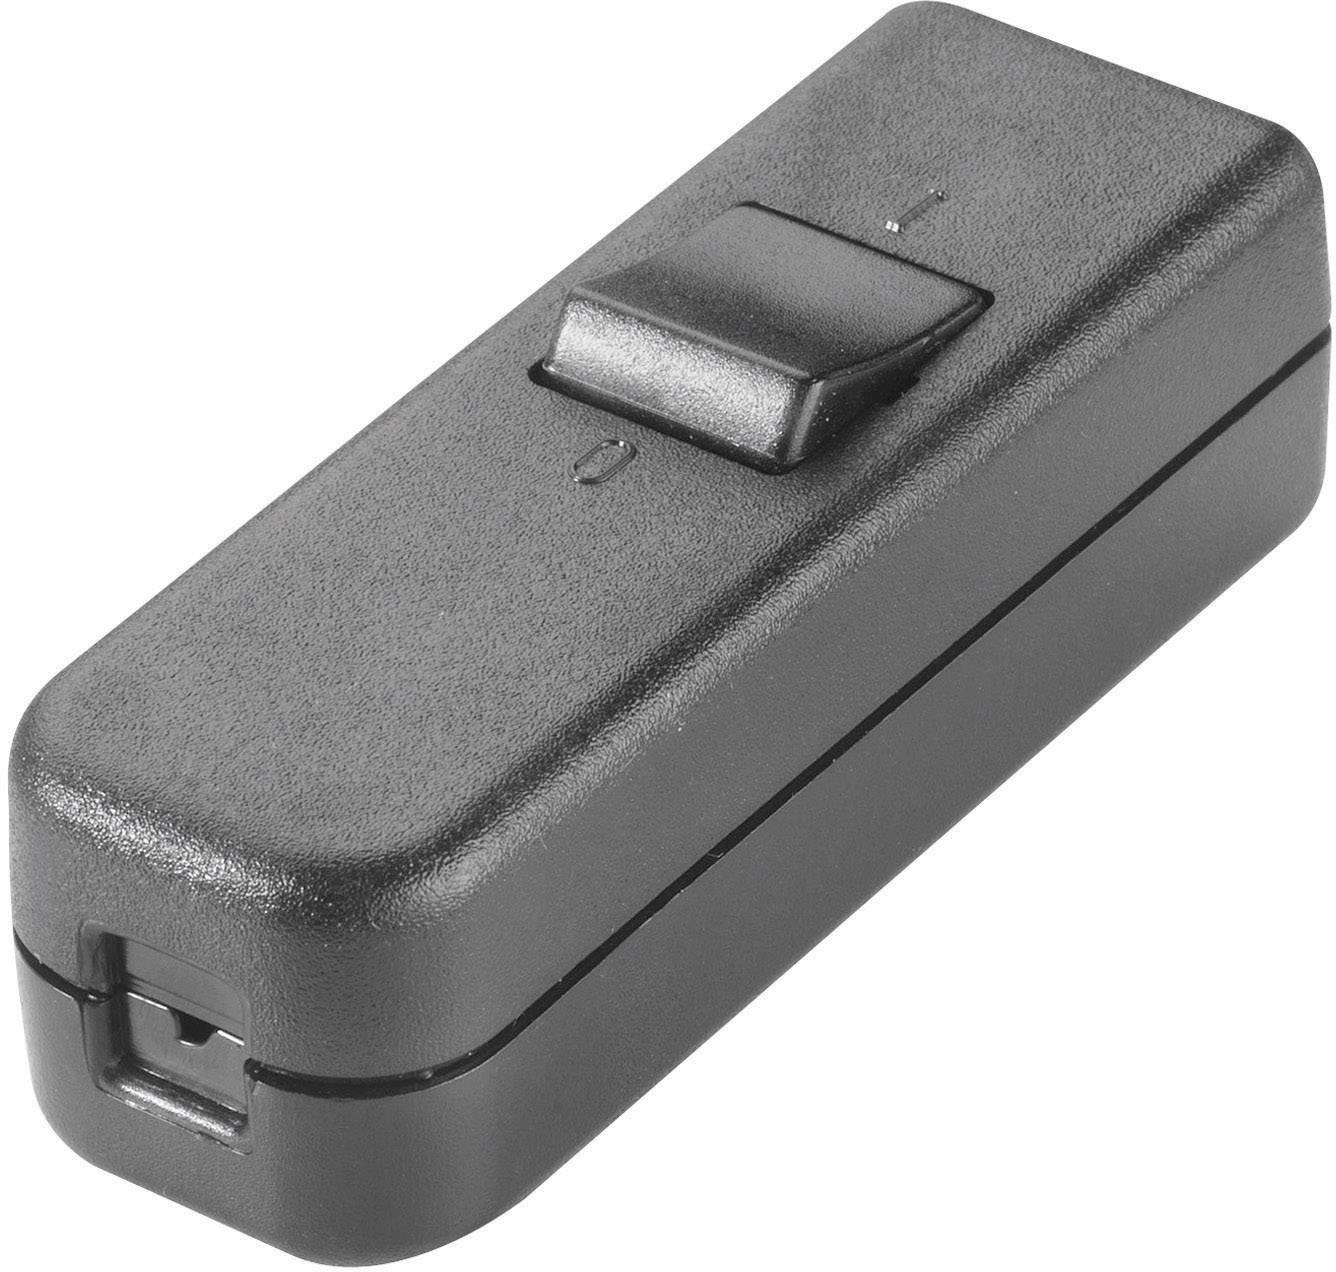 Šňůrový vypínač interBär , 1pólový, 250 V/AC, 6 A, černá